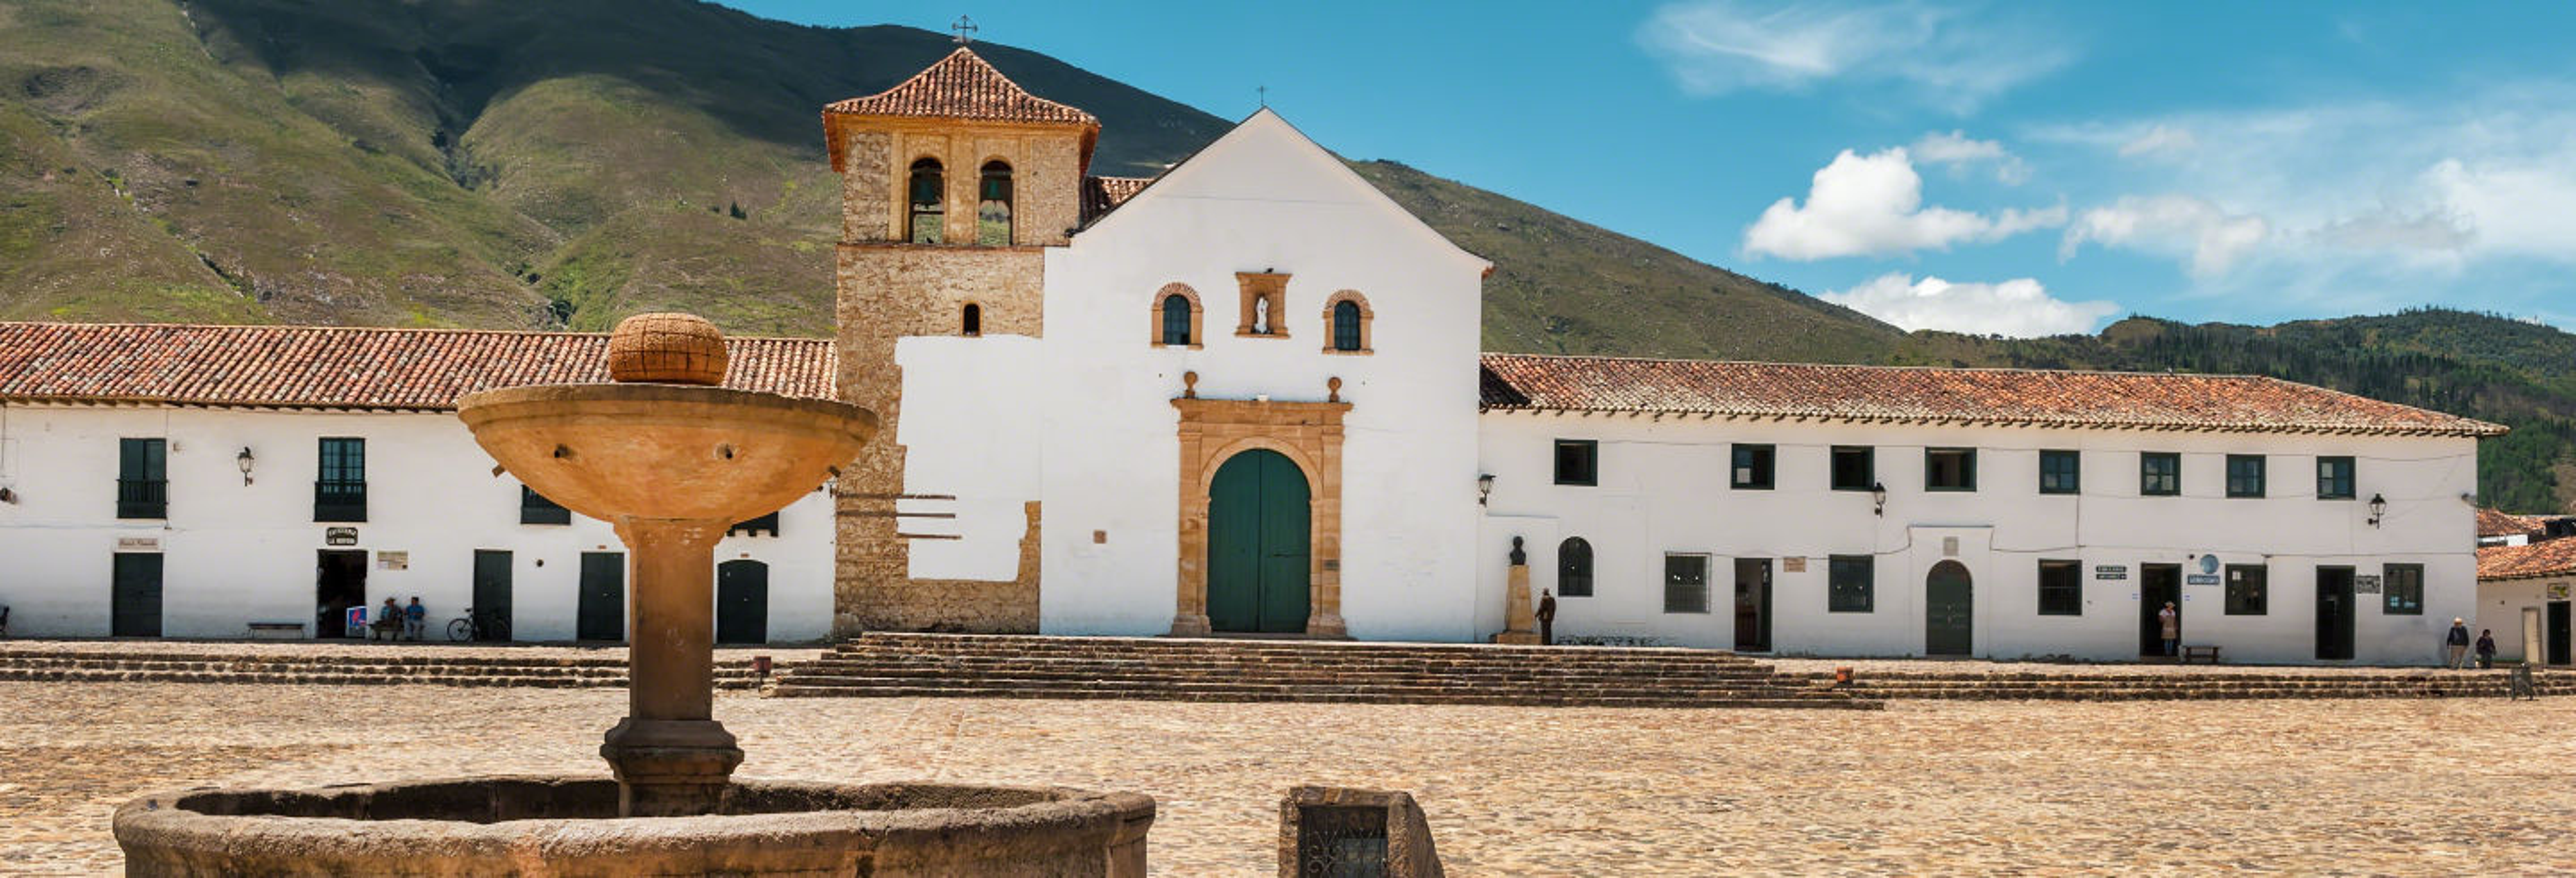 Excursão ao Molino de la Primavera e El Infiernito